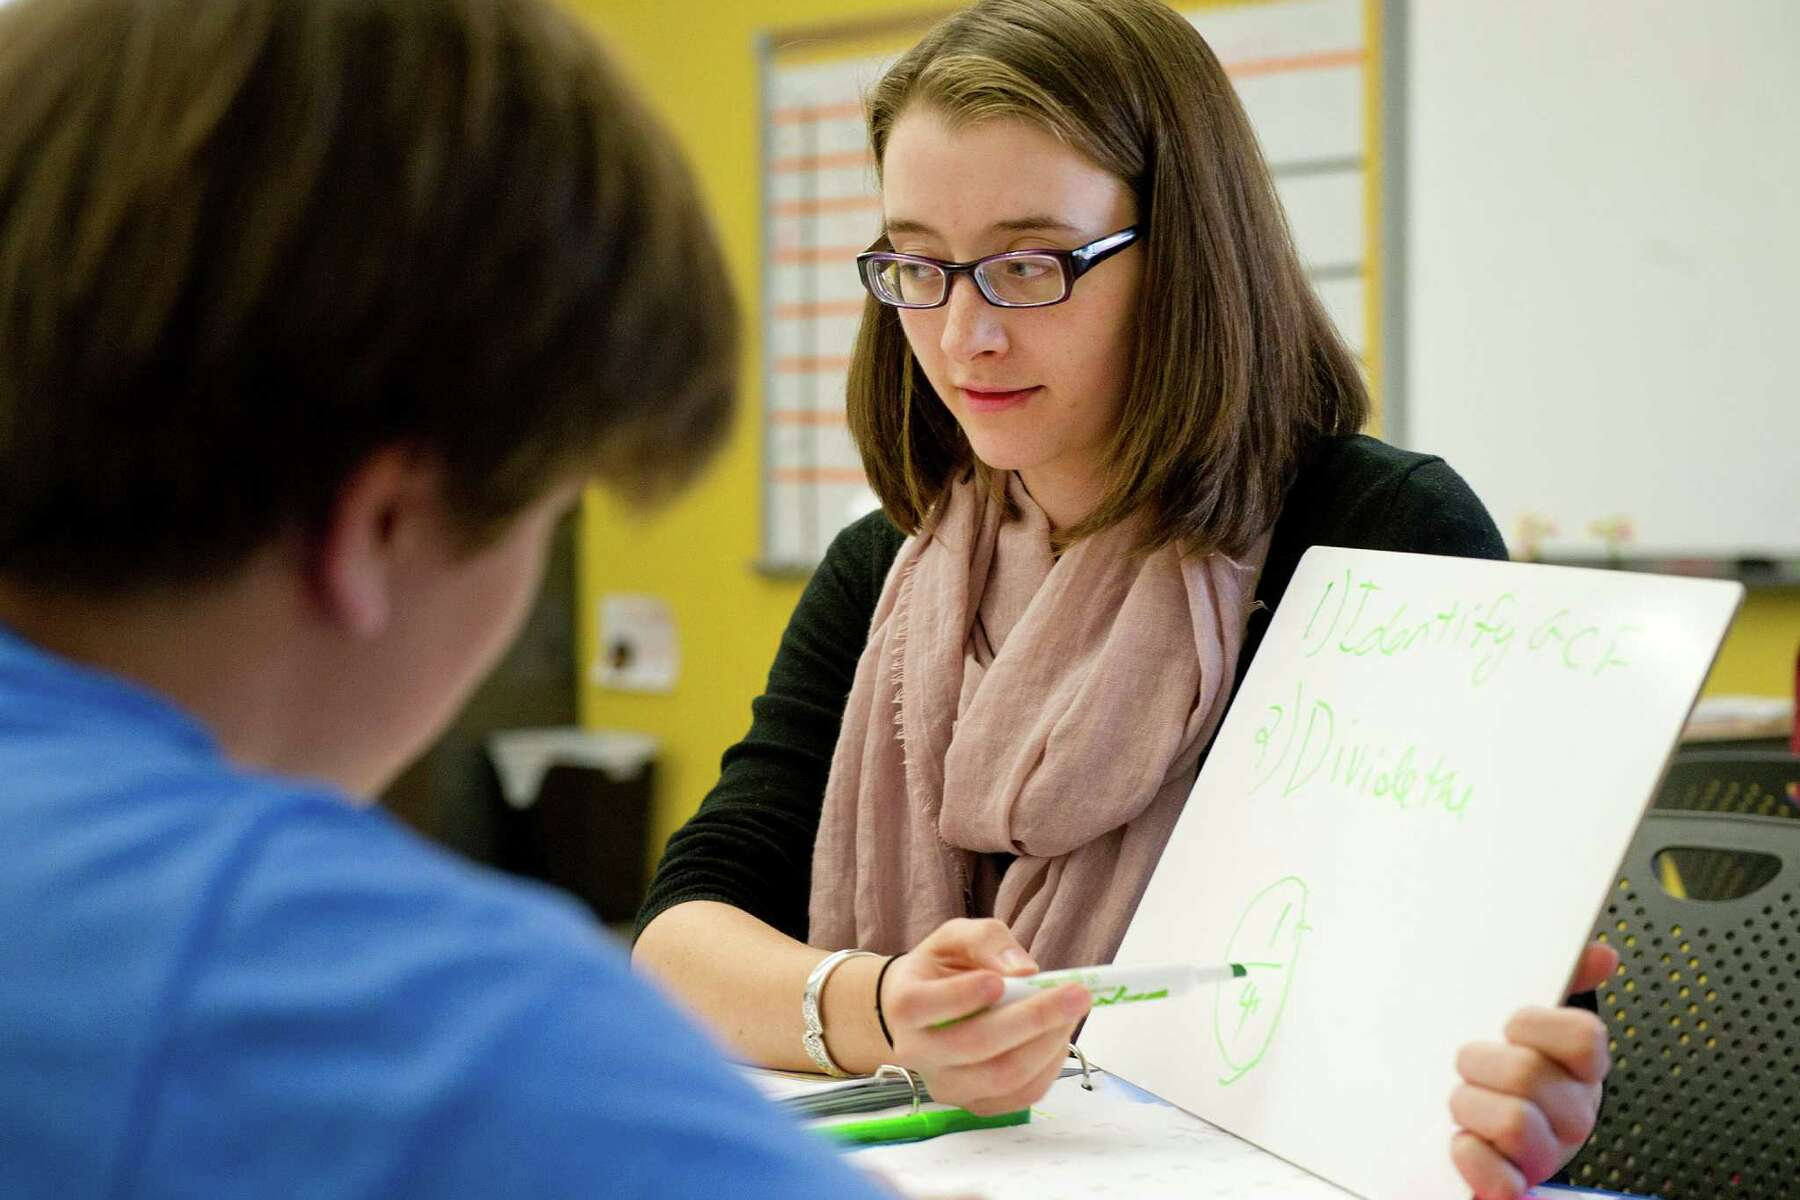 Teacher Shows Brunette Student How It's Done